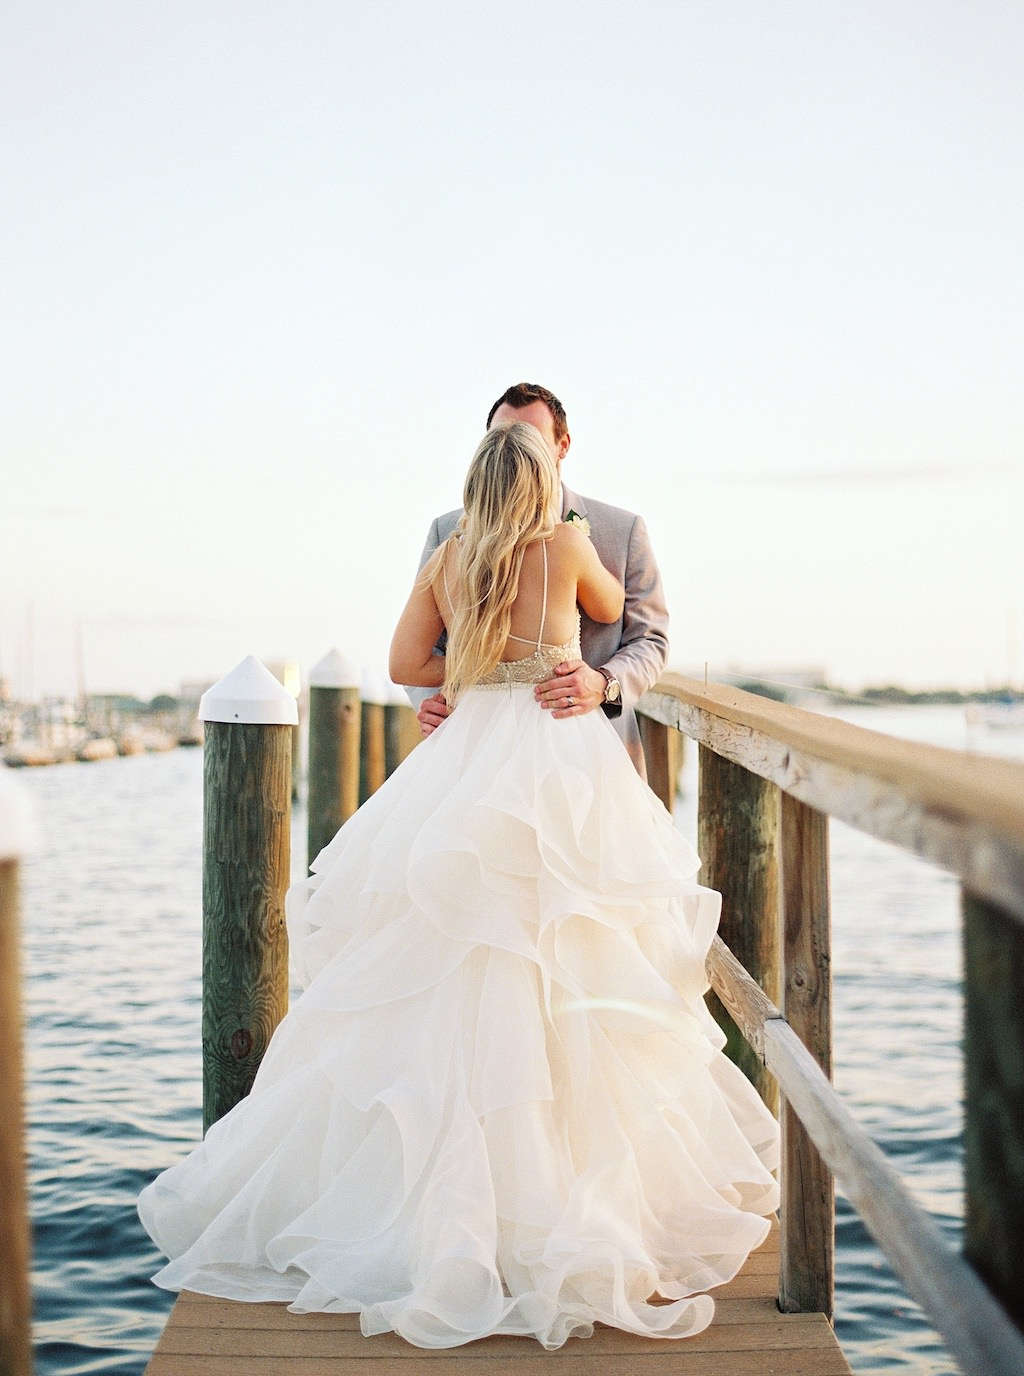 Waterfront Boat Dock Bride and Groom Wedding Portrait | Florida Wedding Venue Palmetto Riverside Bed and Breakfast